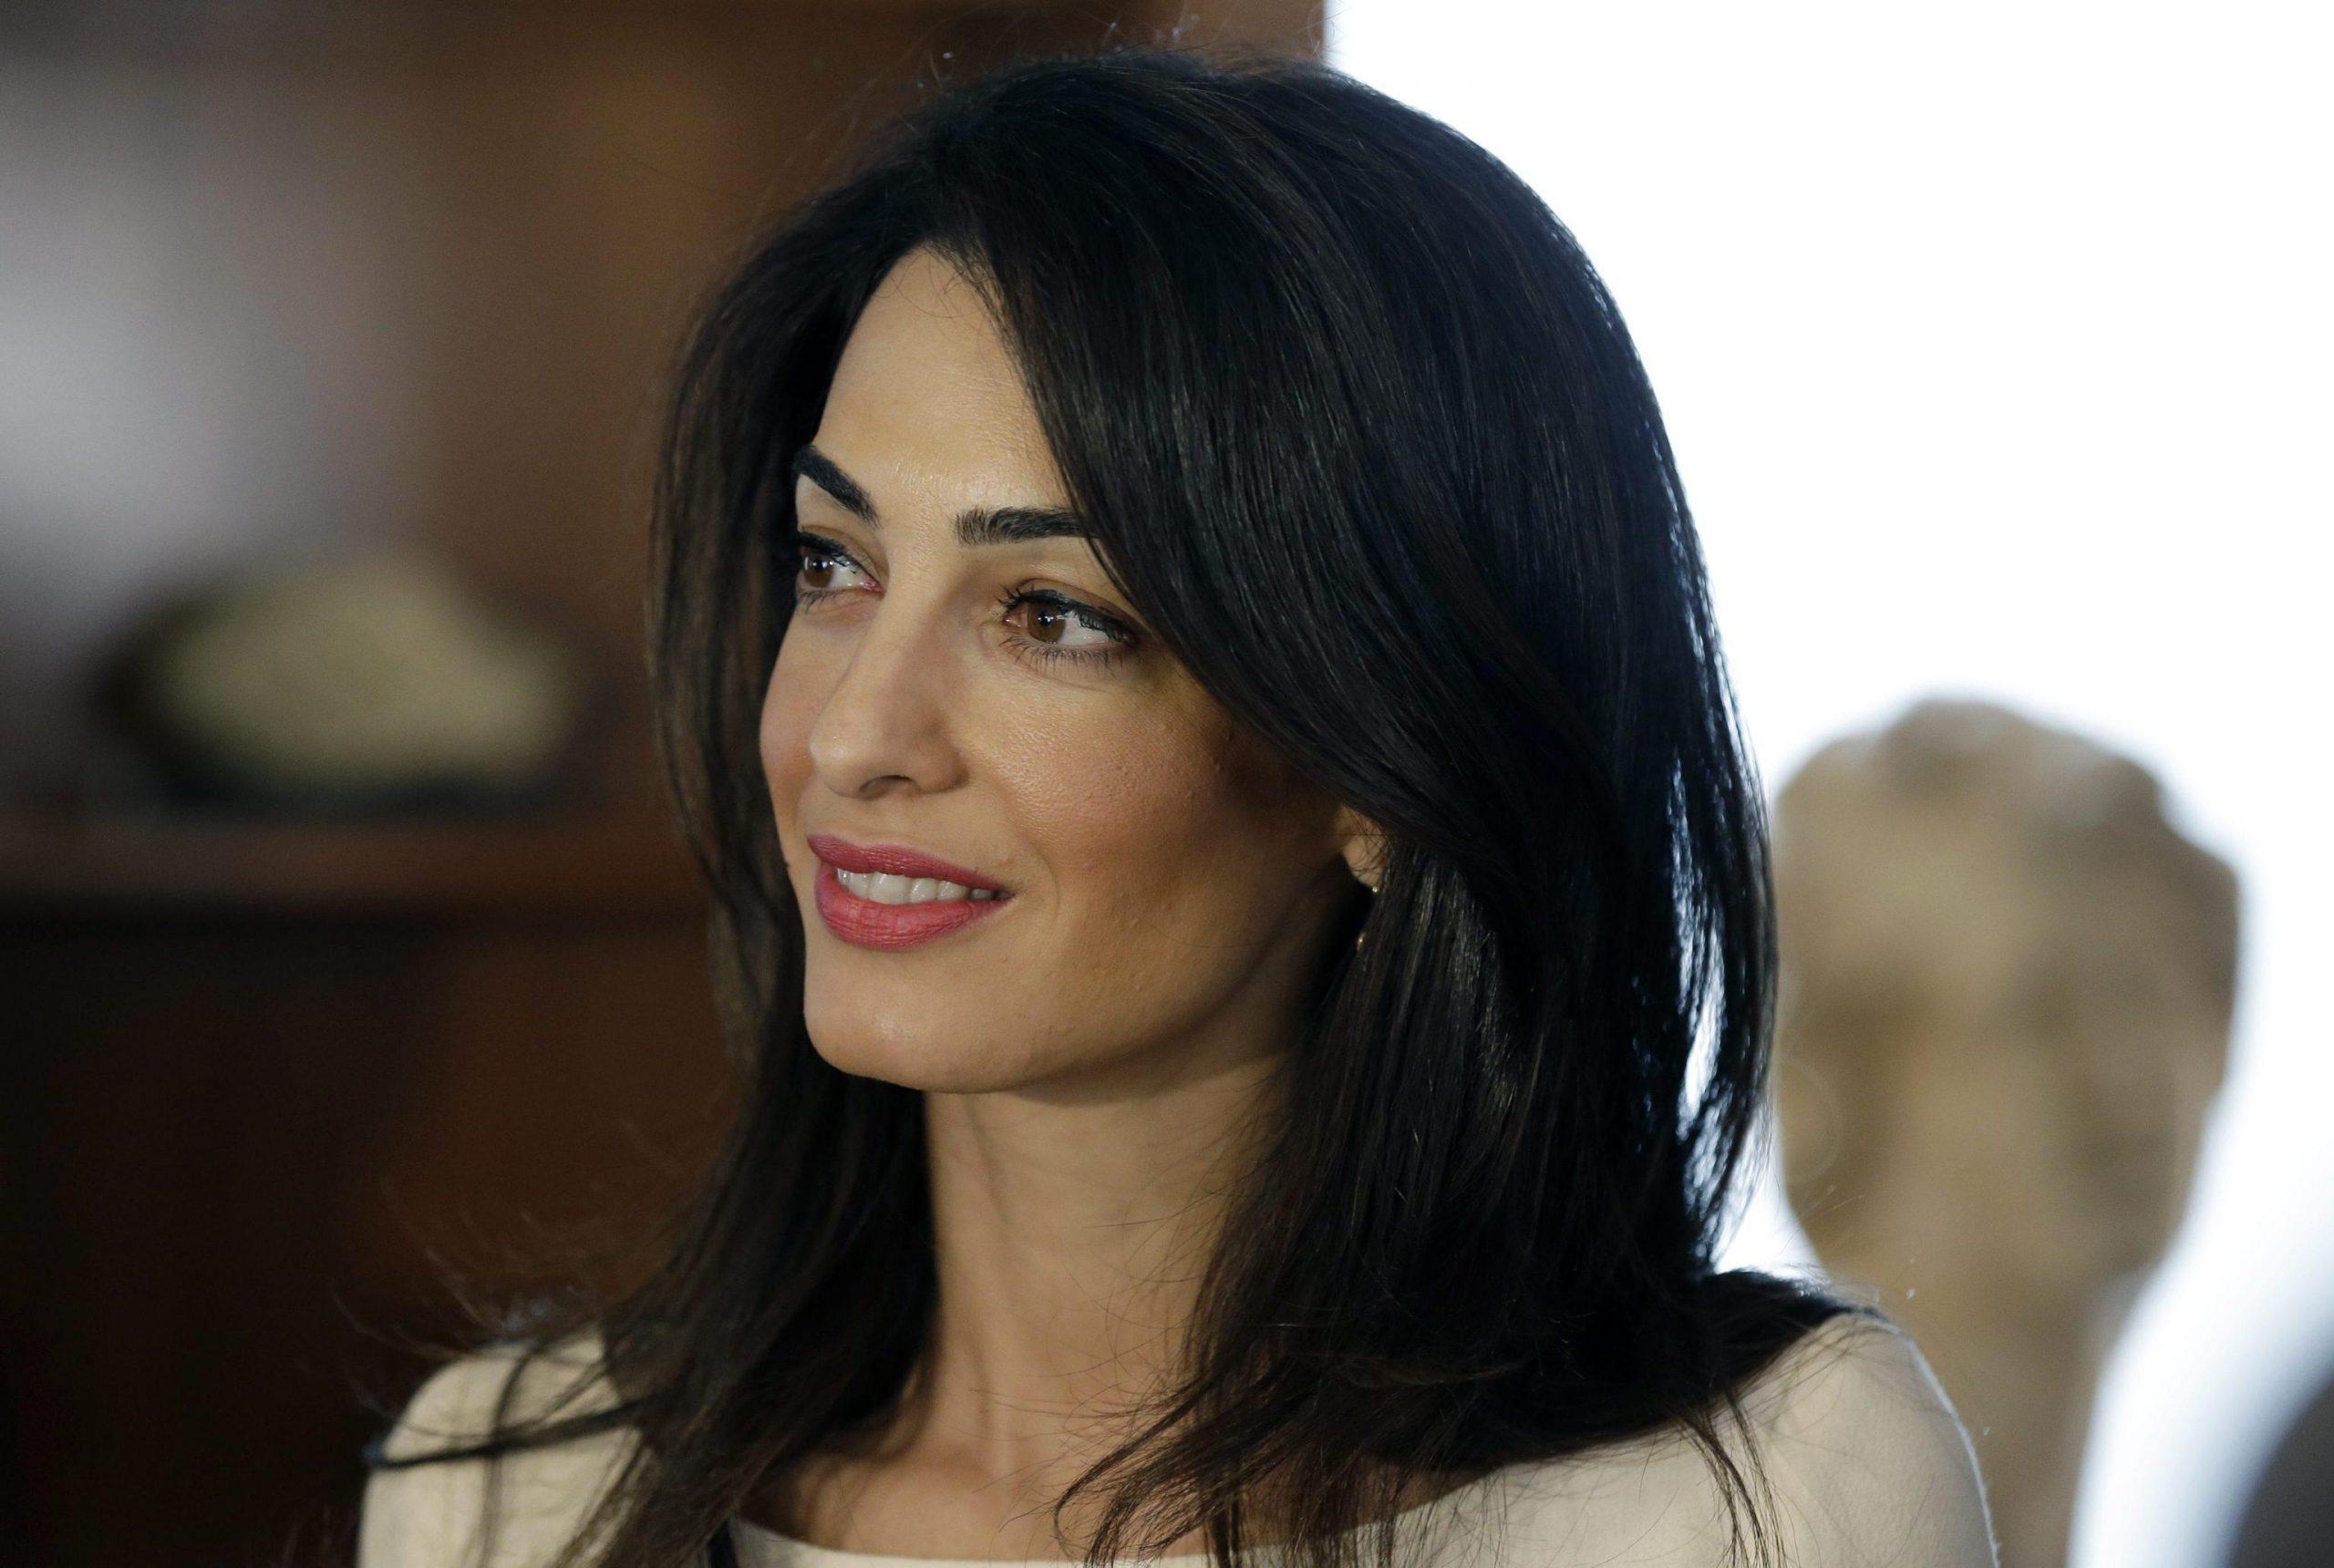 Lawyer Amal Alamuddin Clooney visits Athens